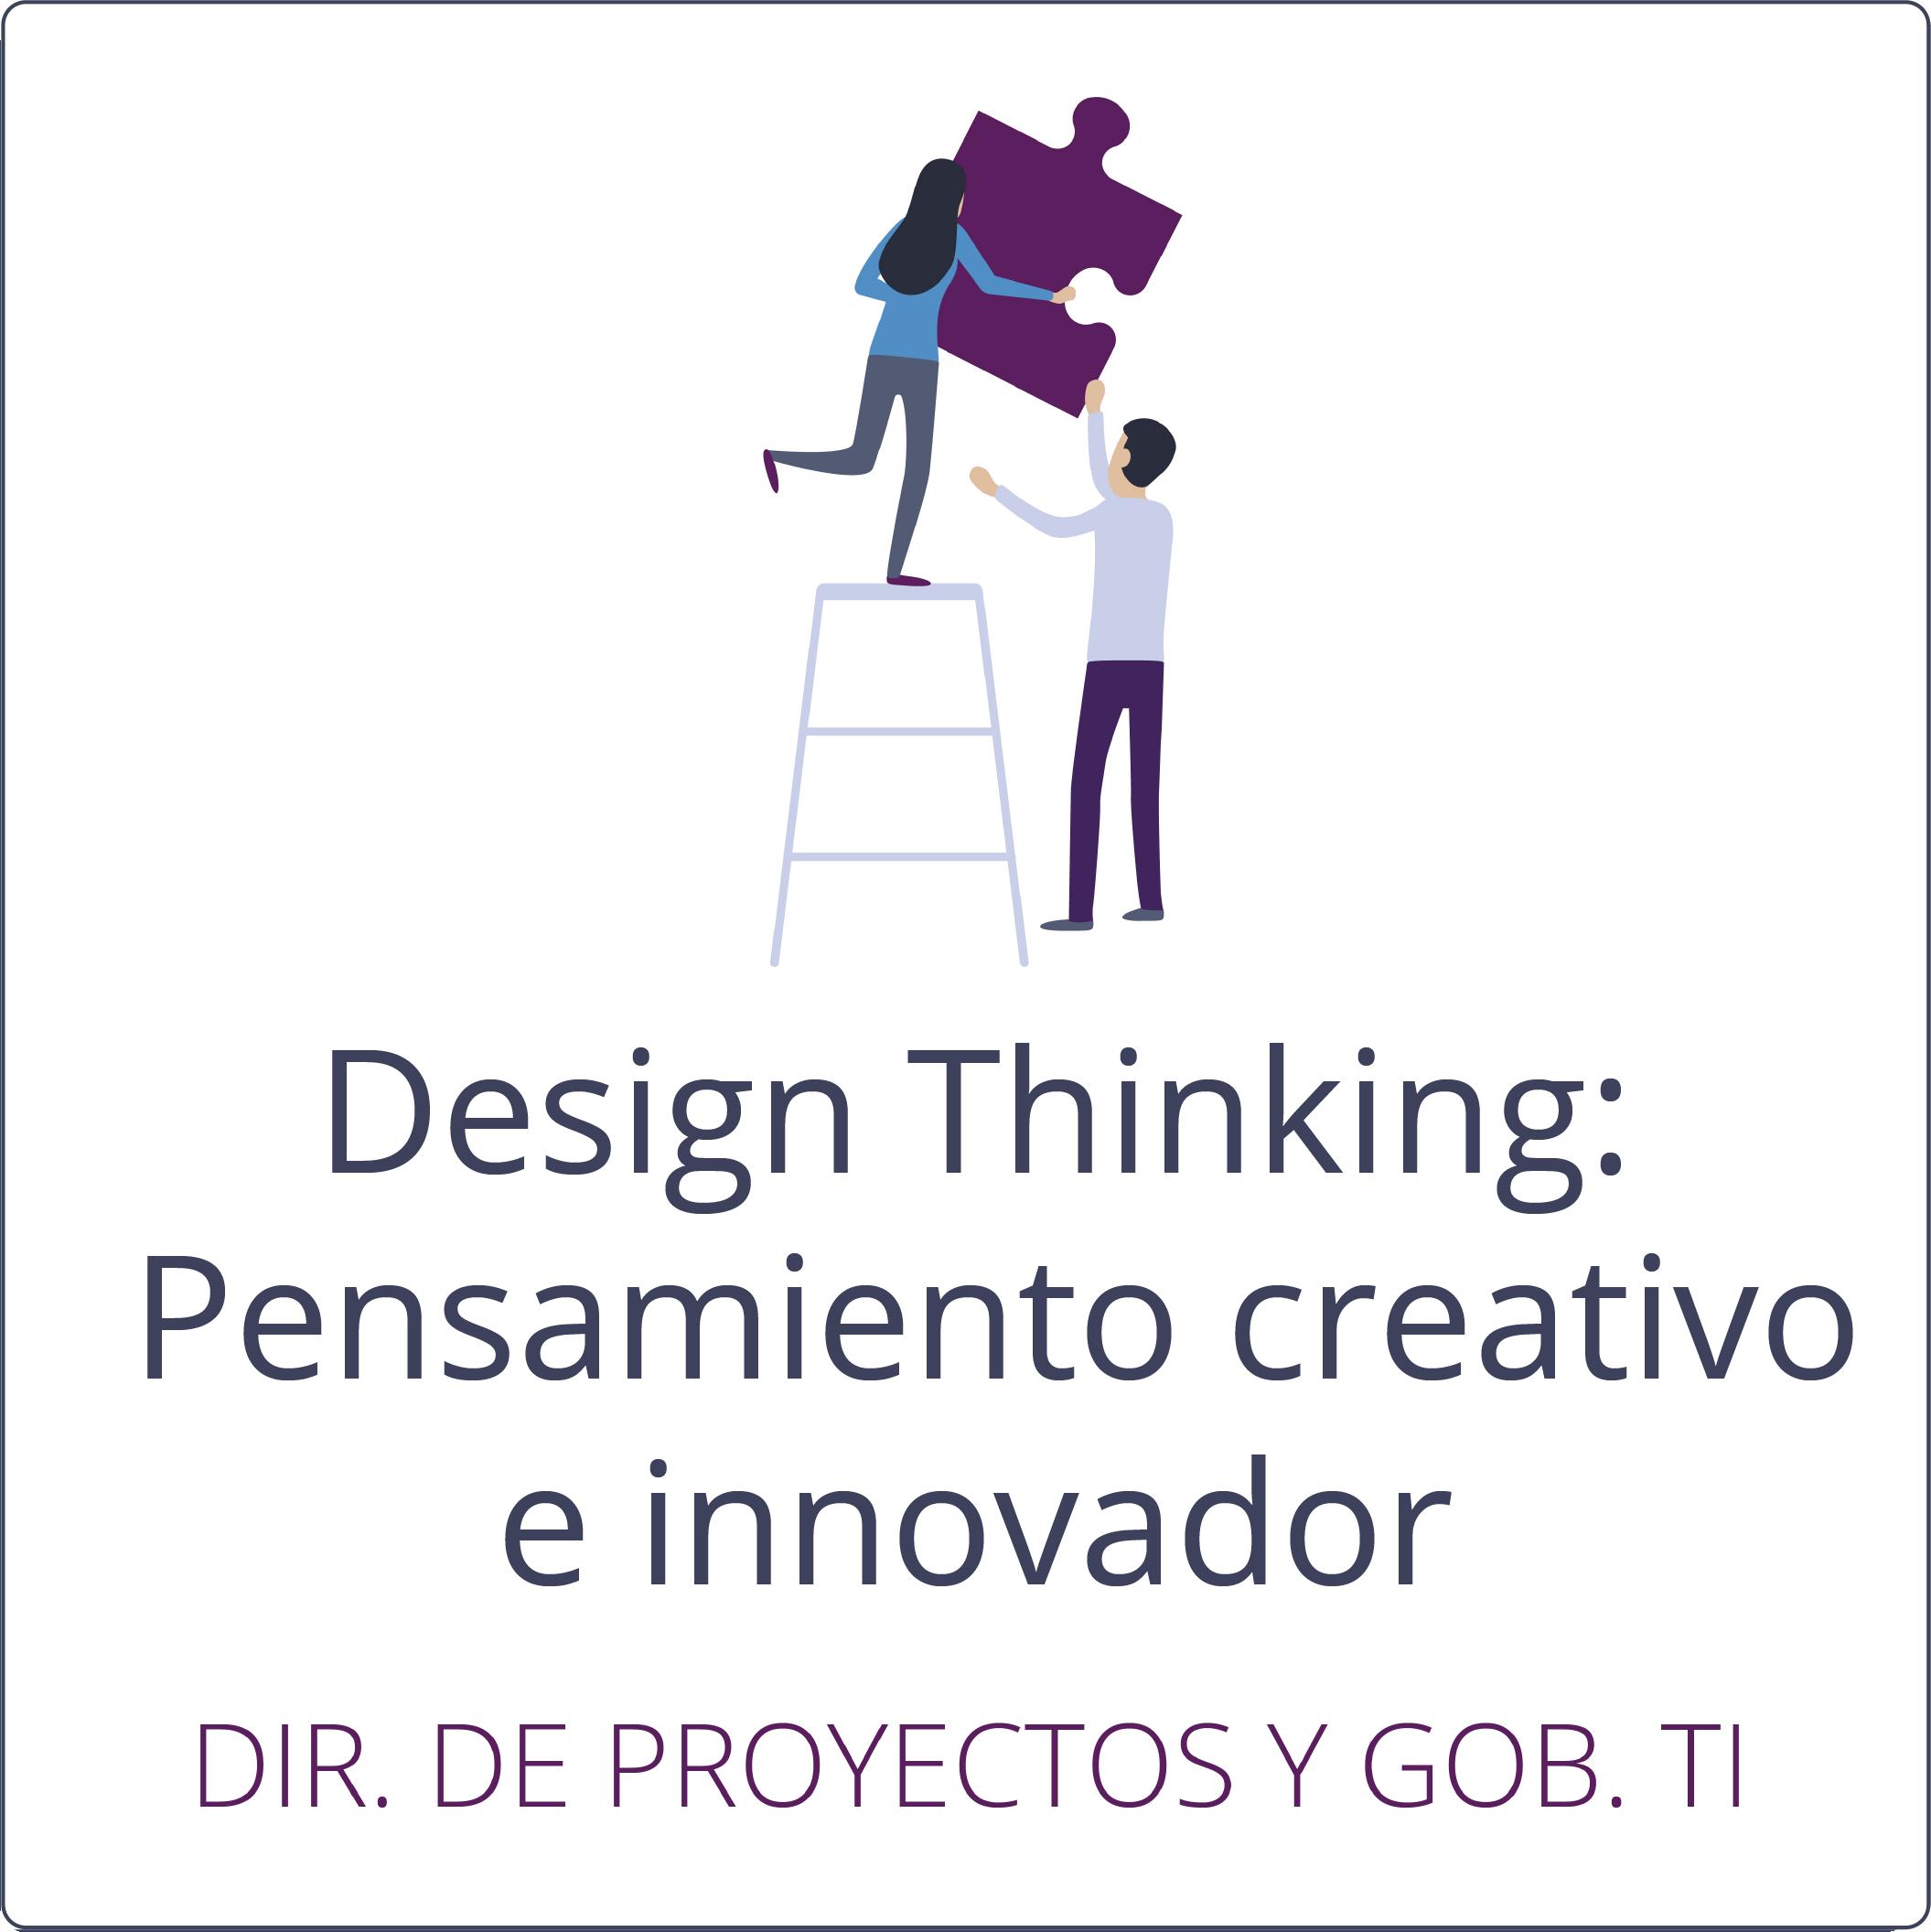 Design Thinking: Pensamiento creativo e innovador